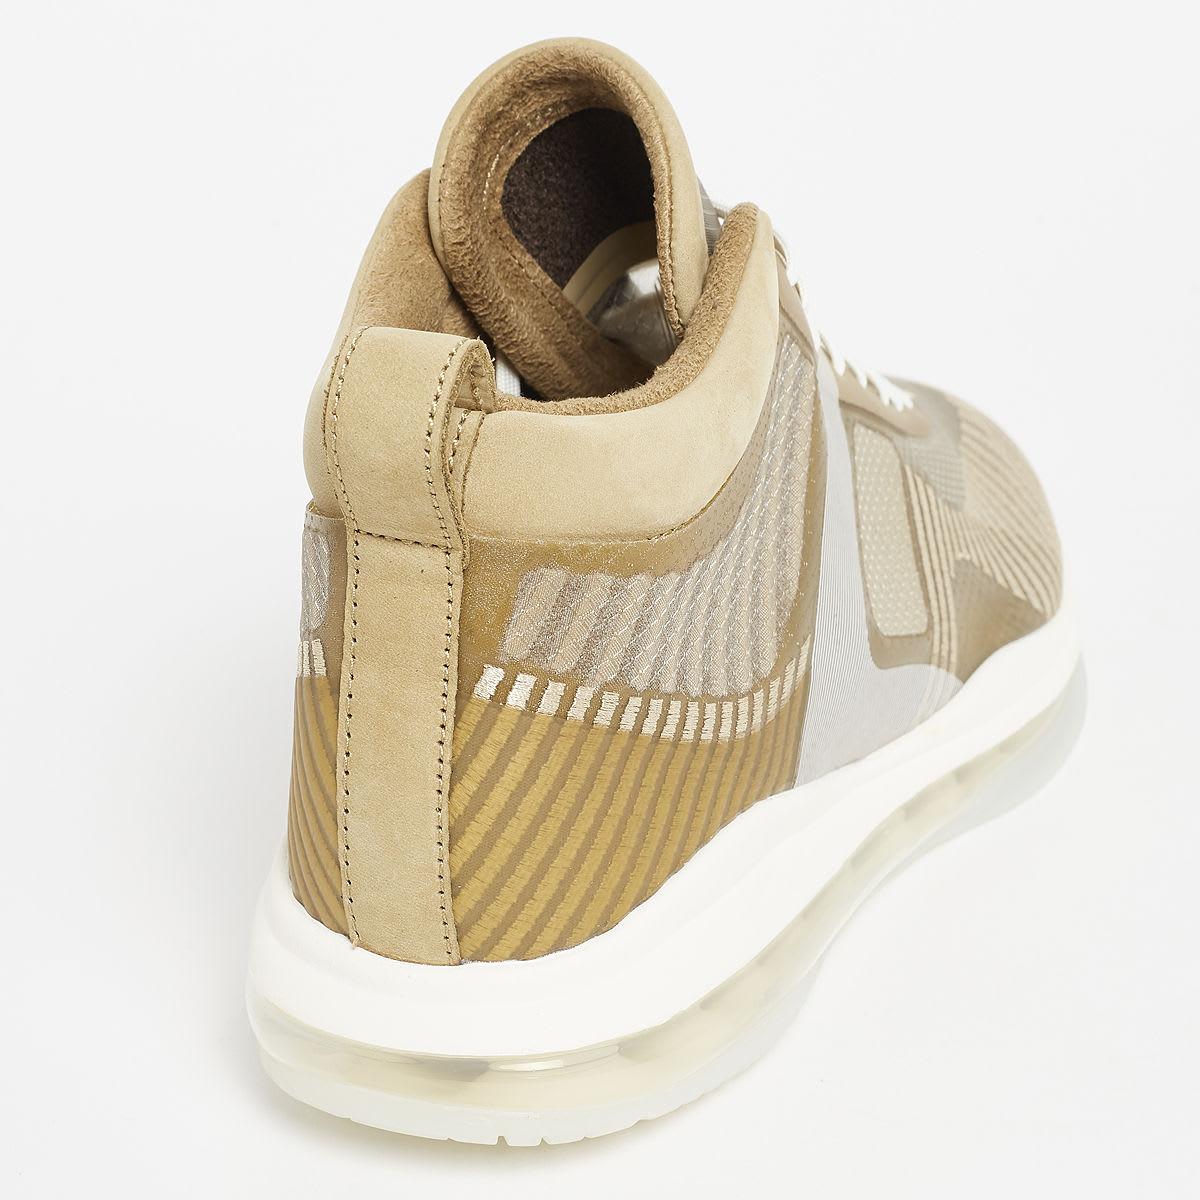 John Elliott x Nike LeBron Icon QS 'Parachute Beige' AQ0114-200 (Heel)